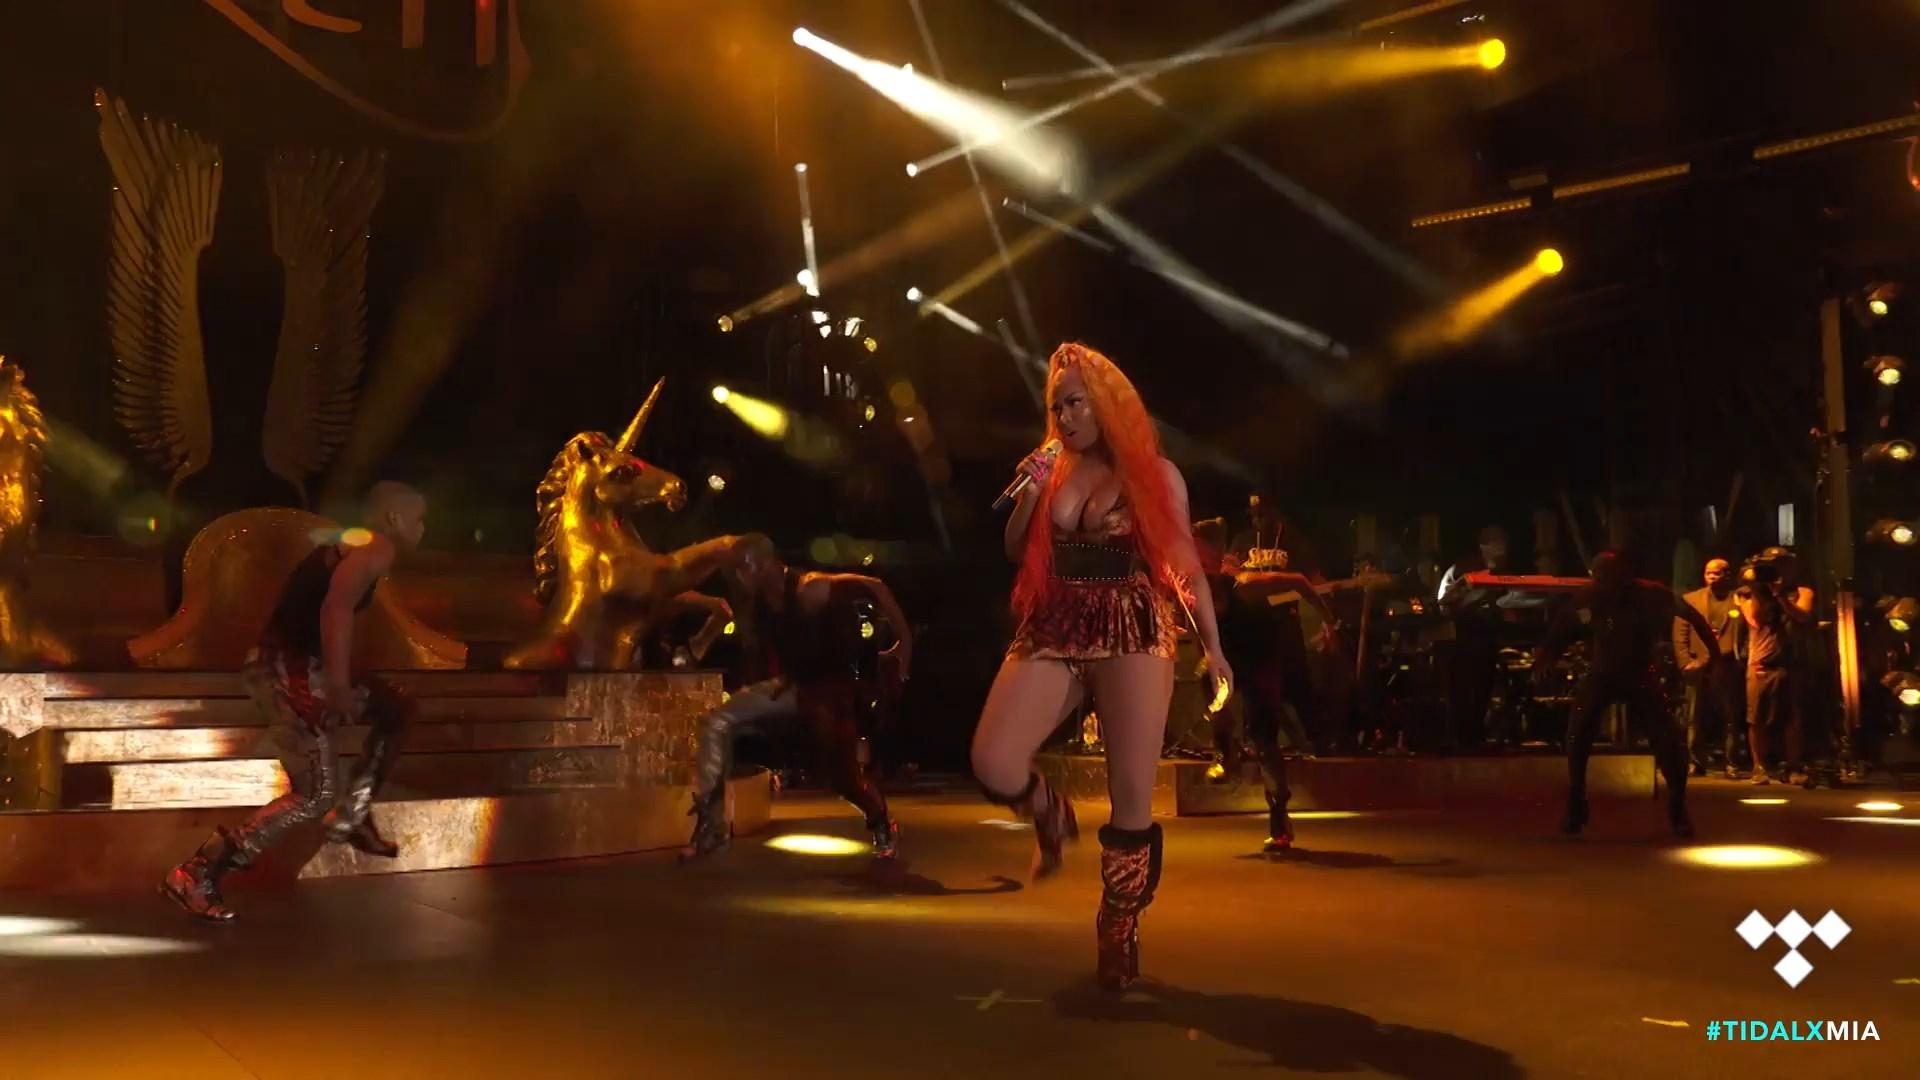 Nicki-Minaj-Nude-TheFappeningBlog.com-6.jpg